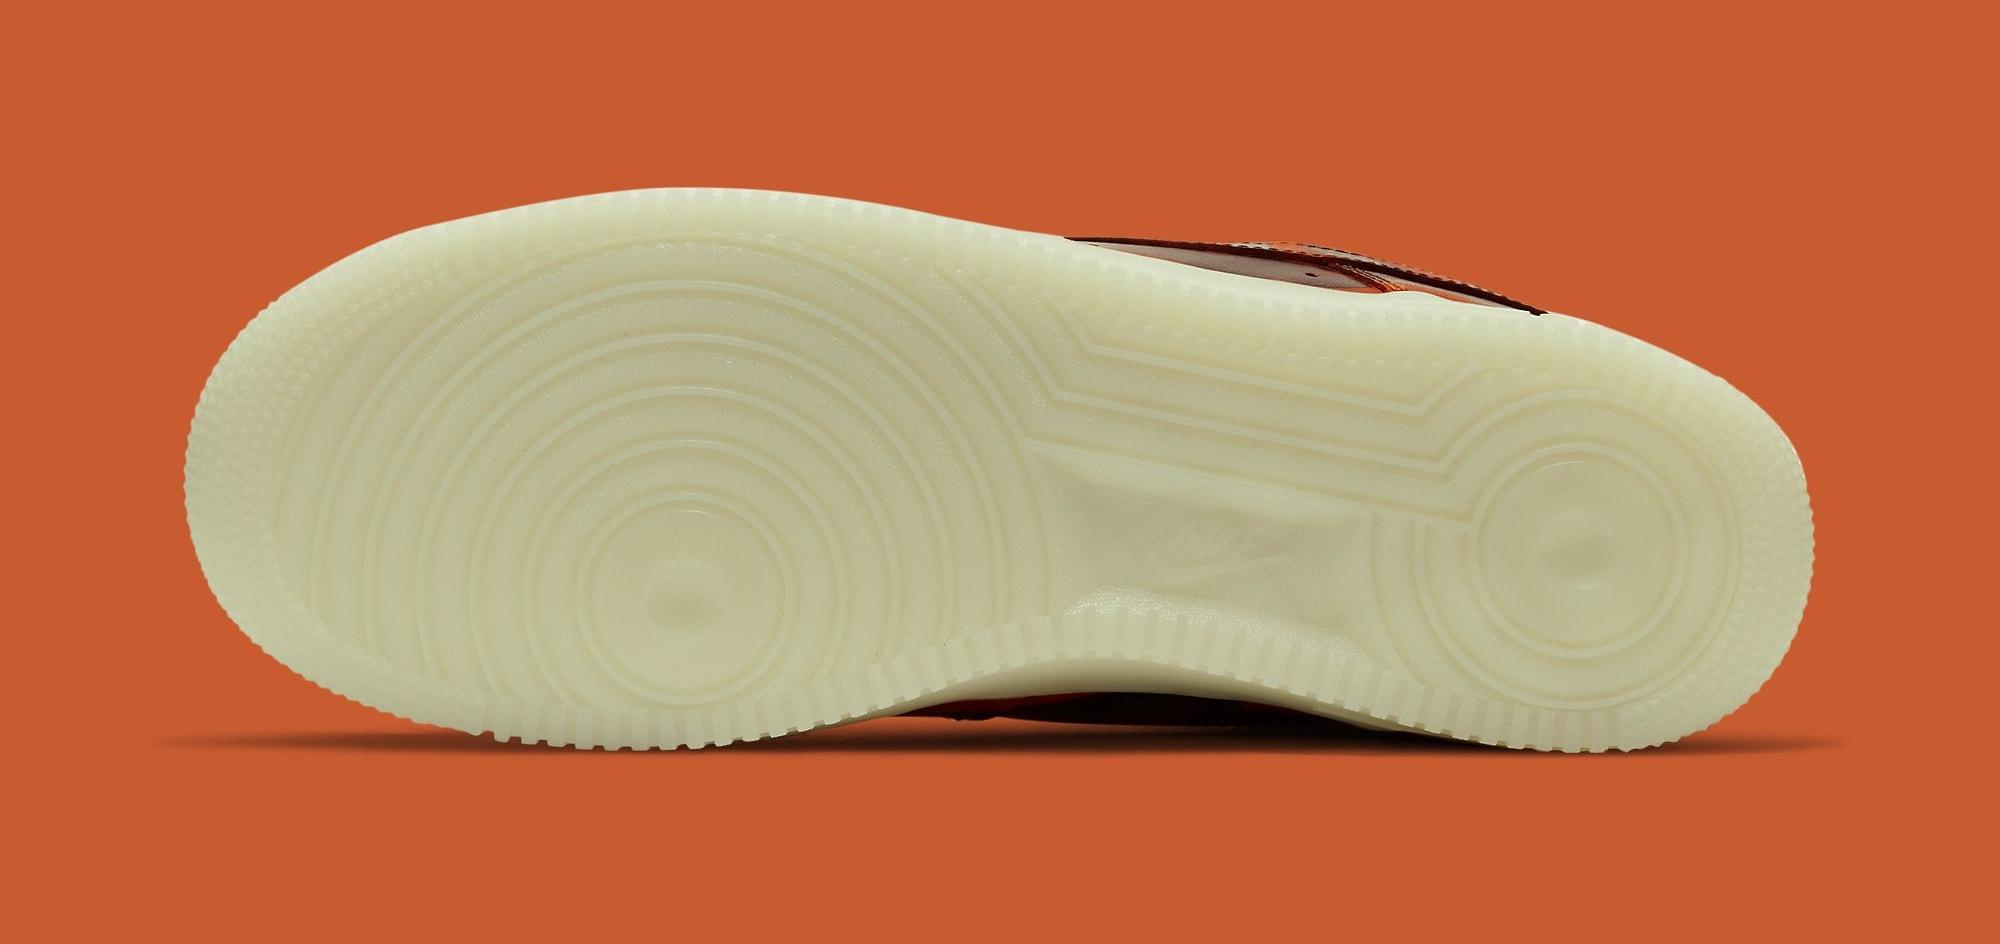 Nike Air Force 1 Low Skeleton 'Orange' CU8067-800 Outsole